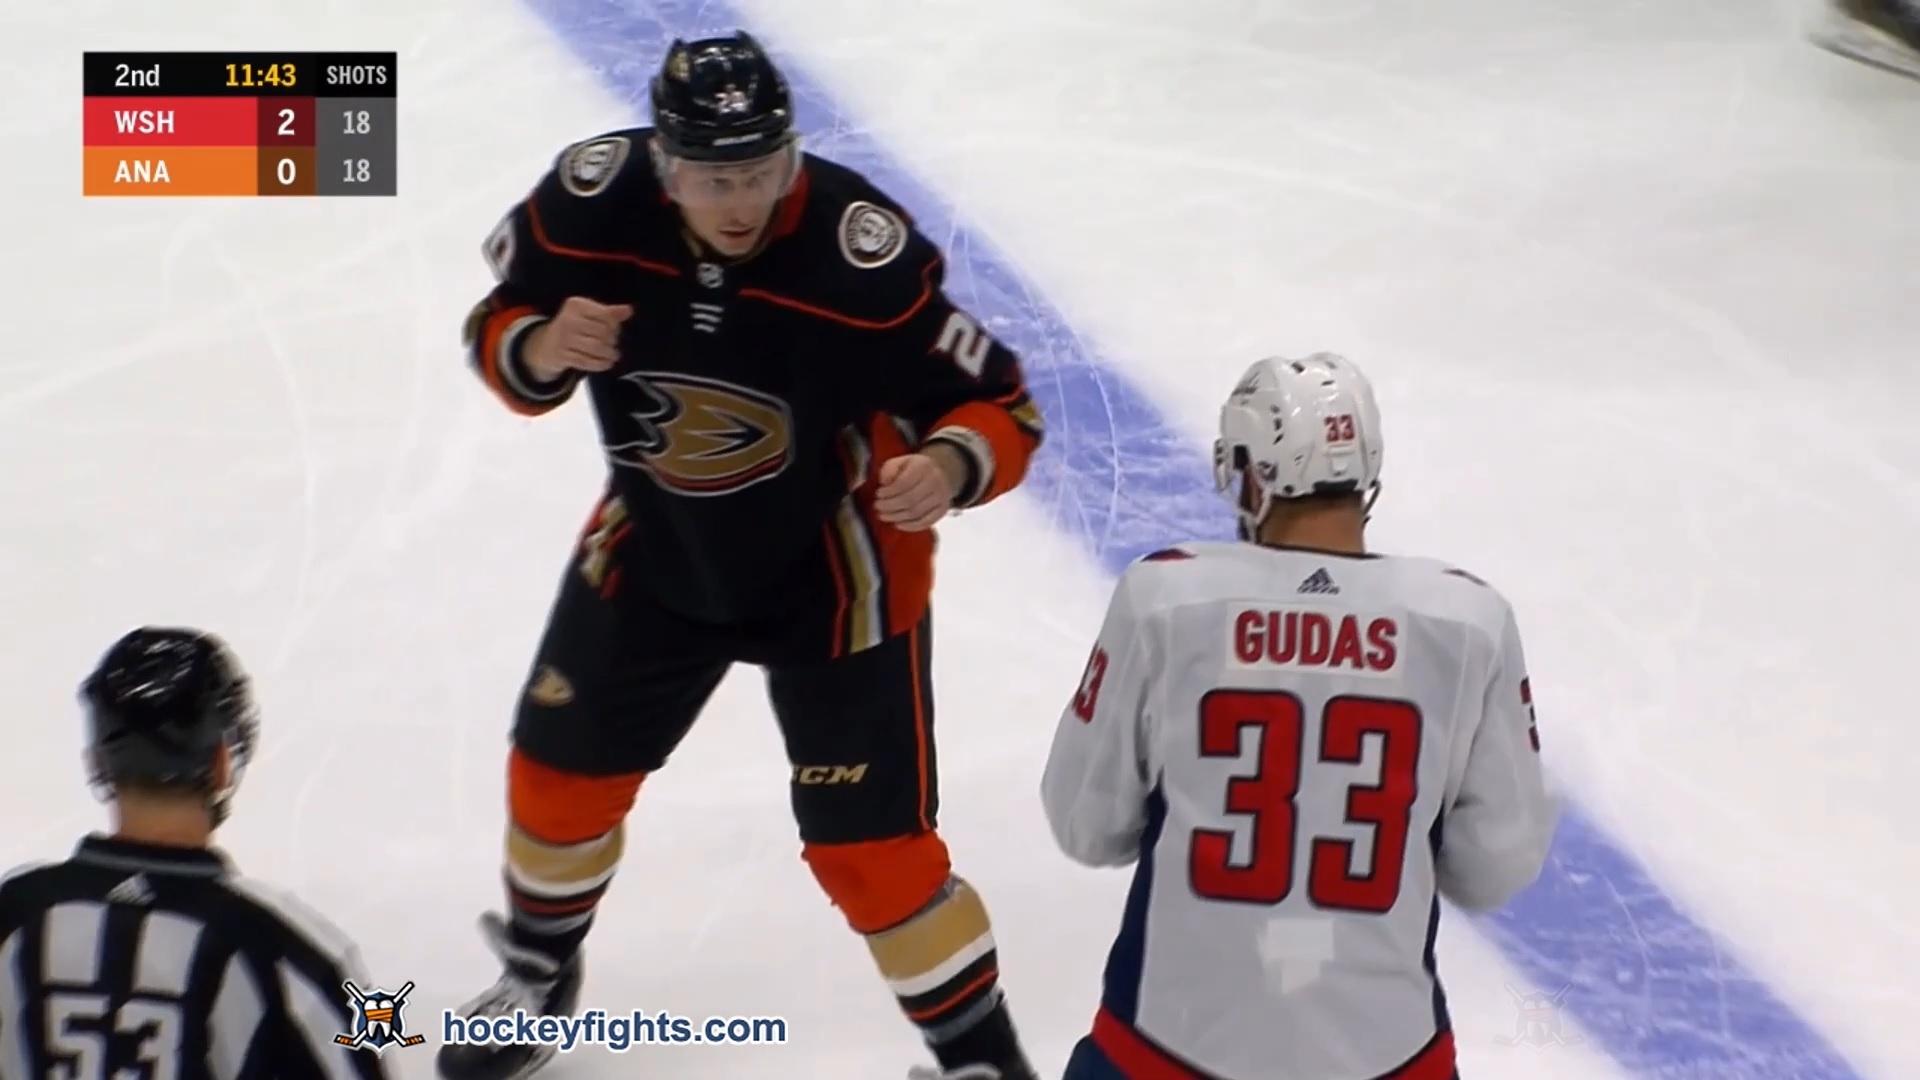 Nicolas Deslauriers vs. Radko Gudas